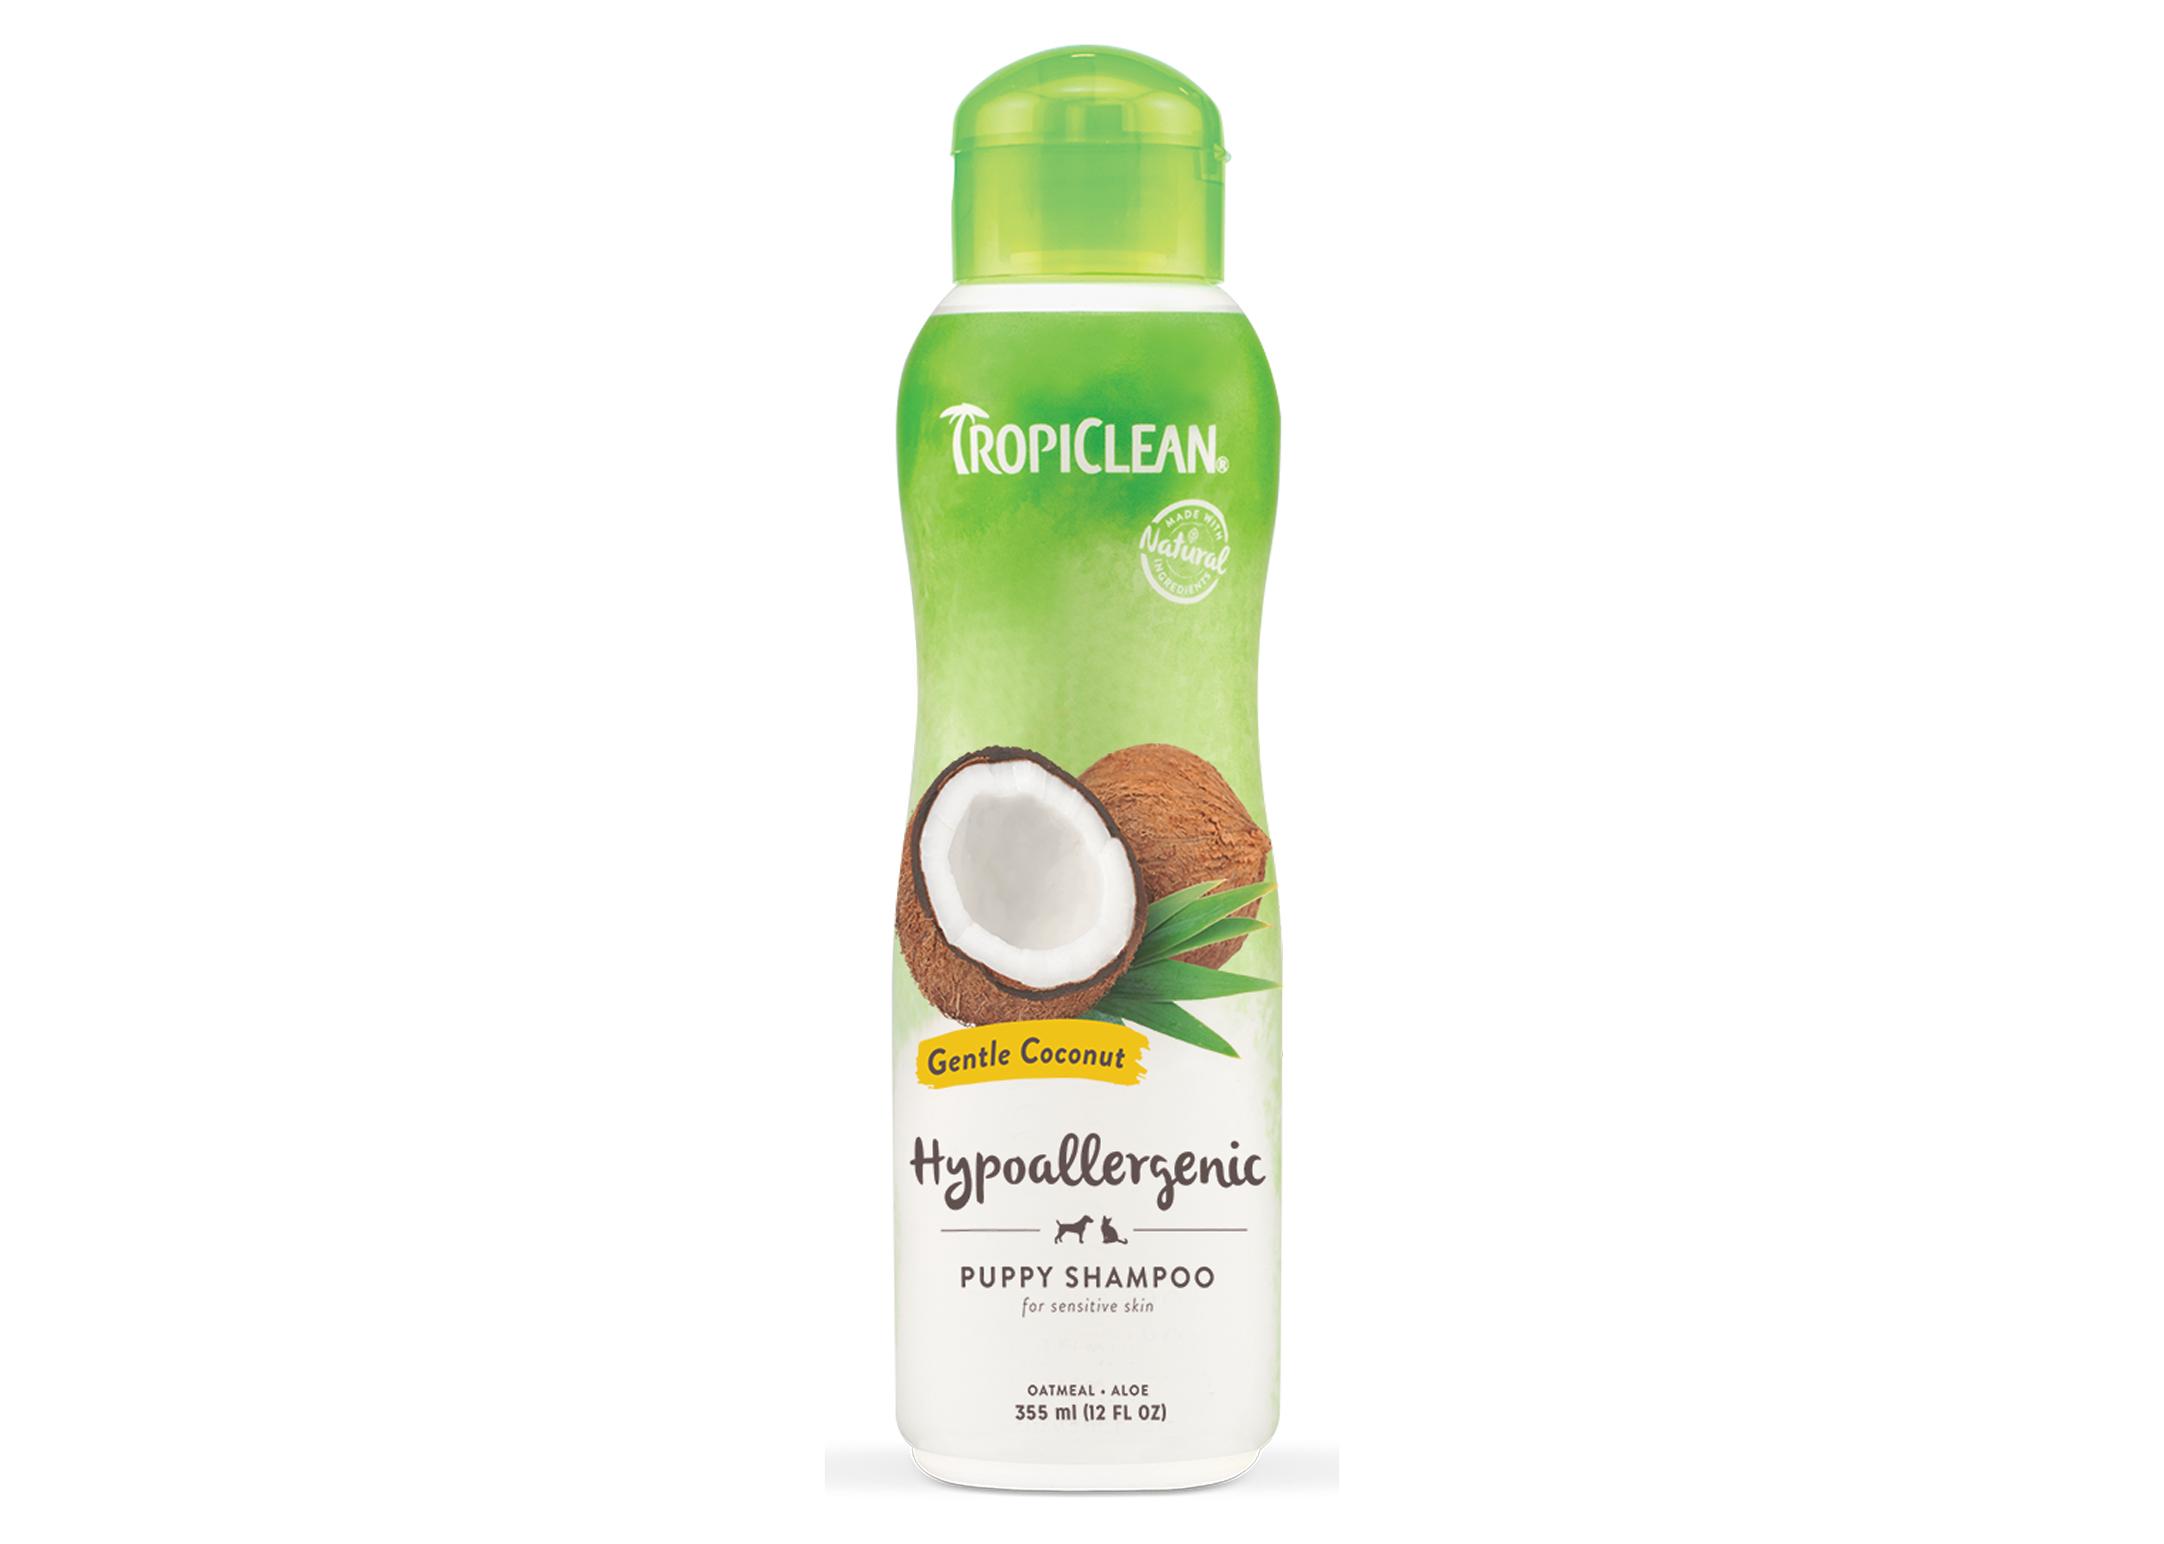 Tropiclean Gentle Coconut Puppy Shampoo - Hypo-Allergenic Shampoo